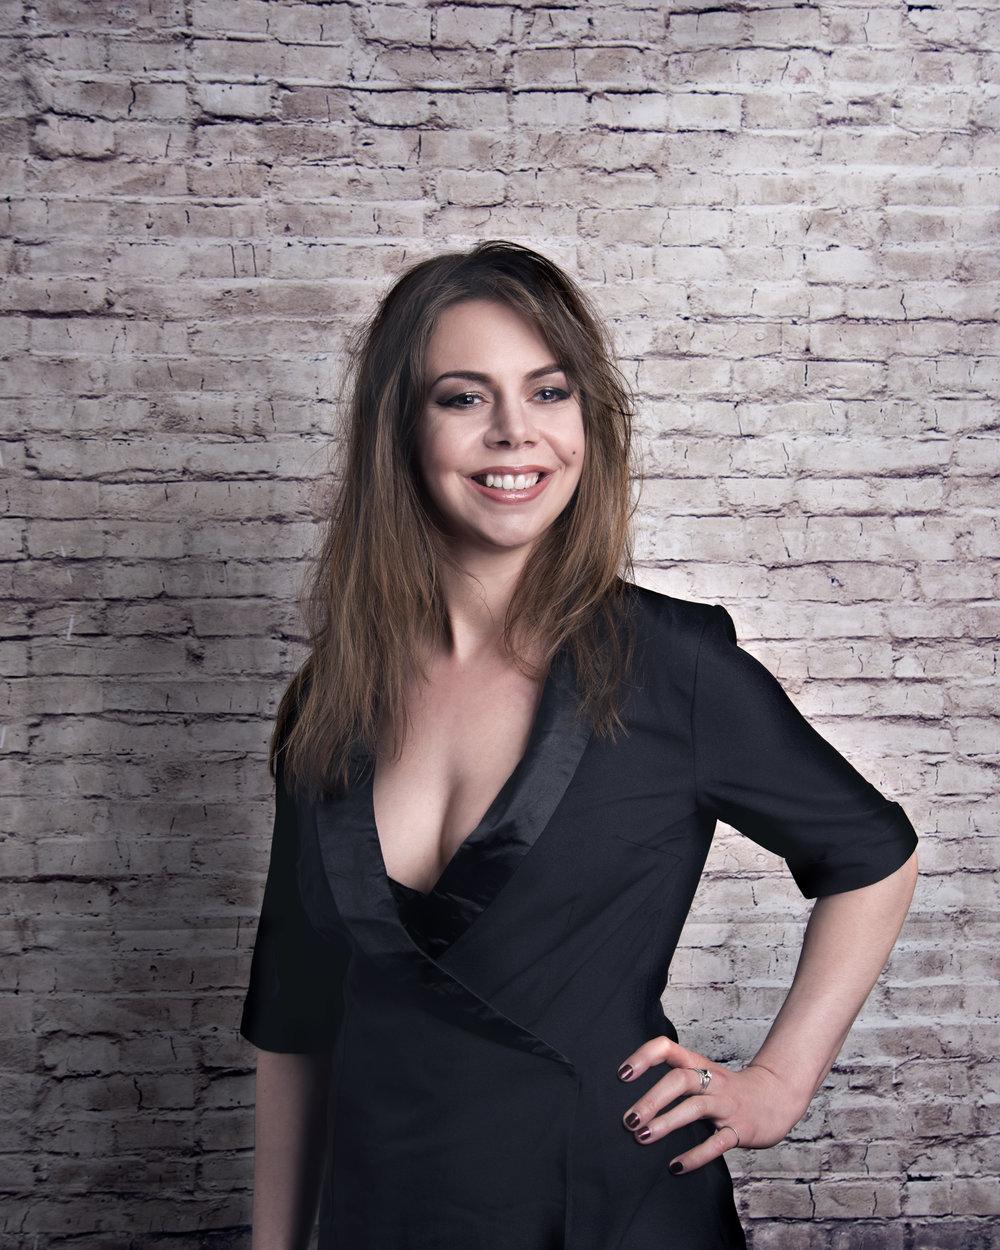 Georgie Morrell - Comedian, writer, presenter and actress